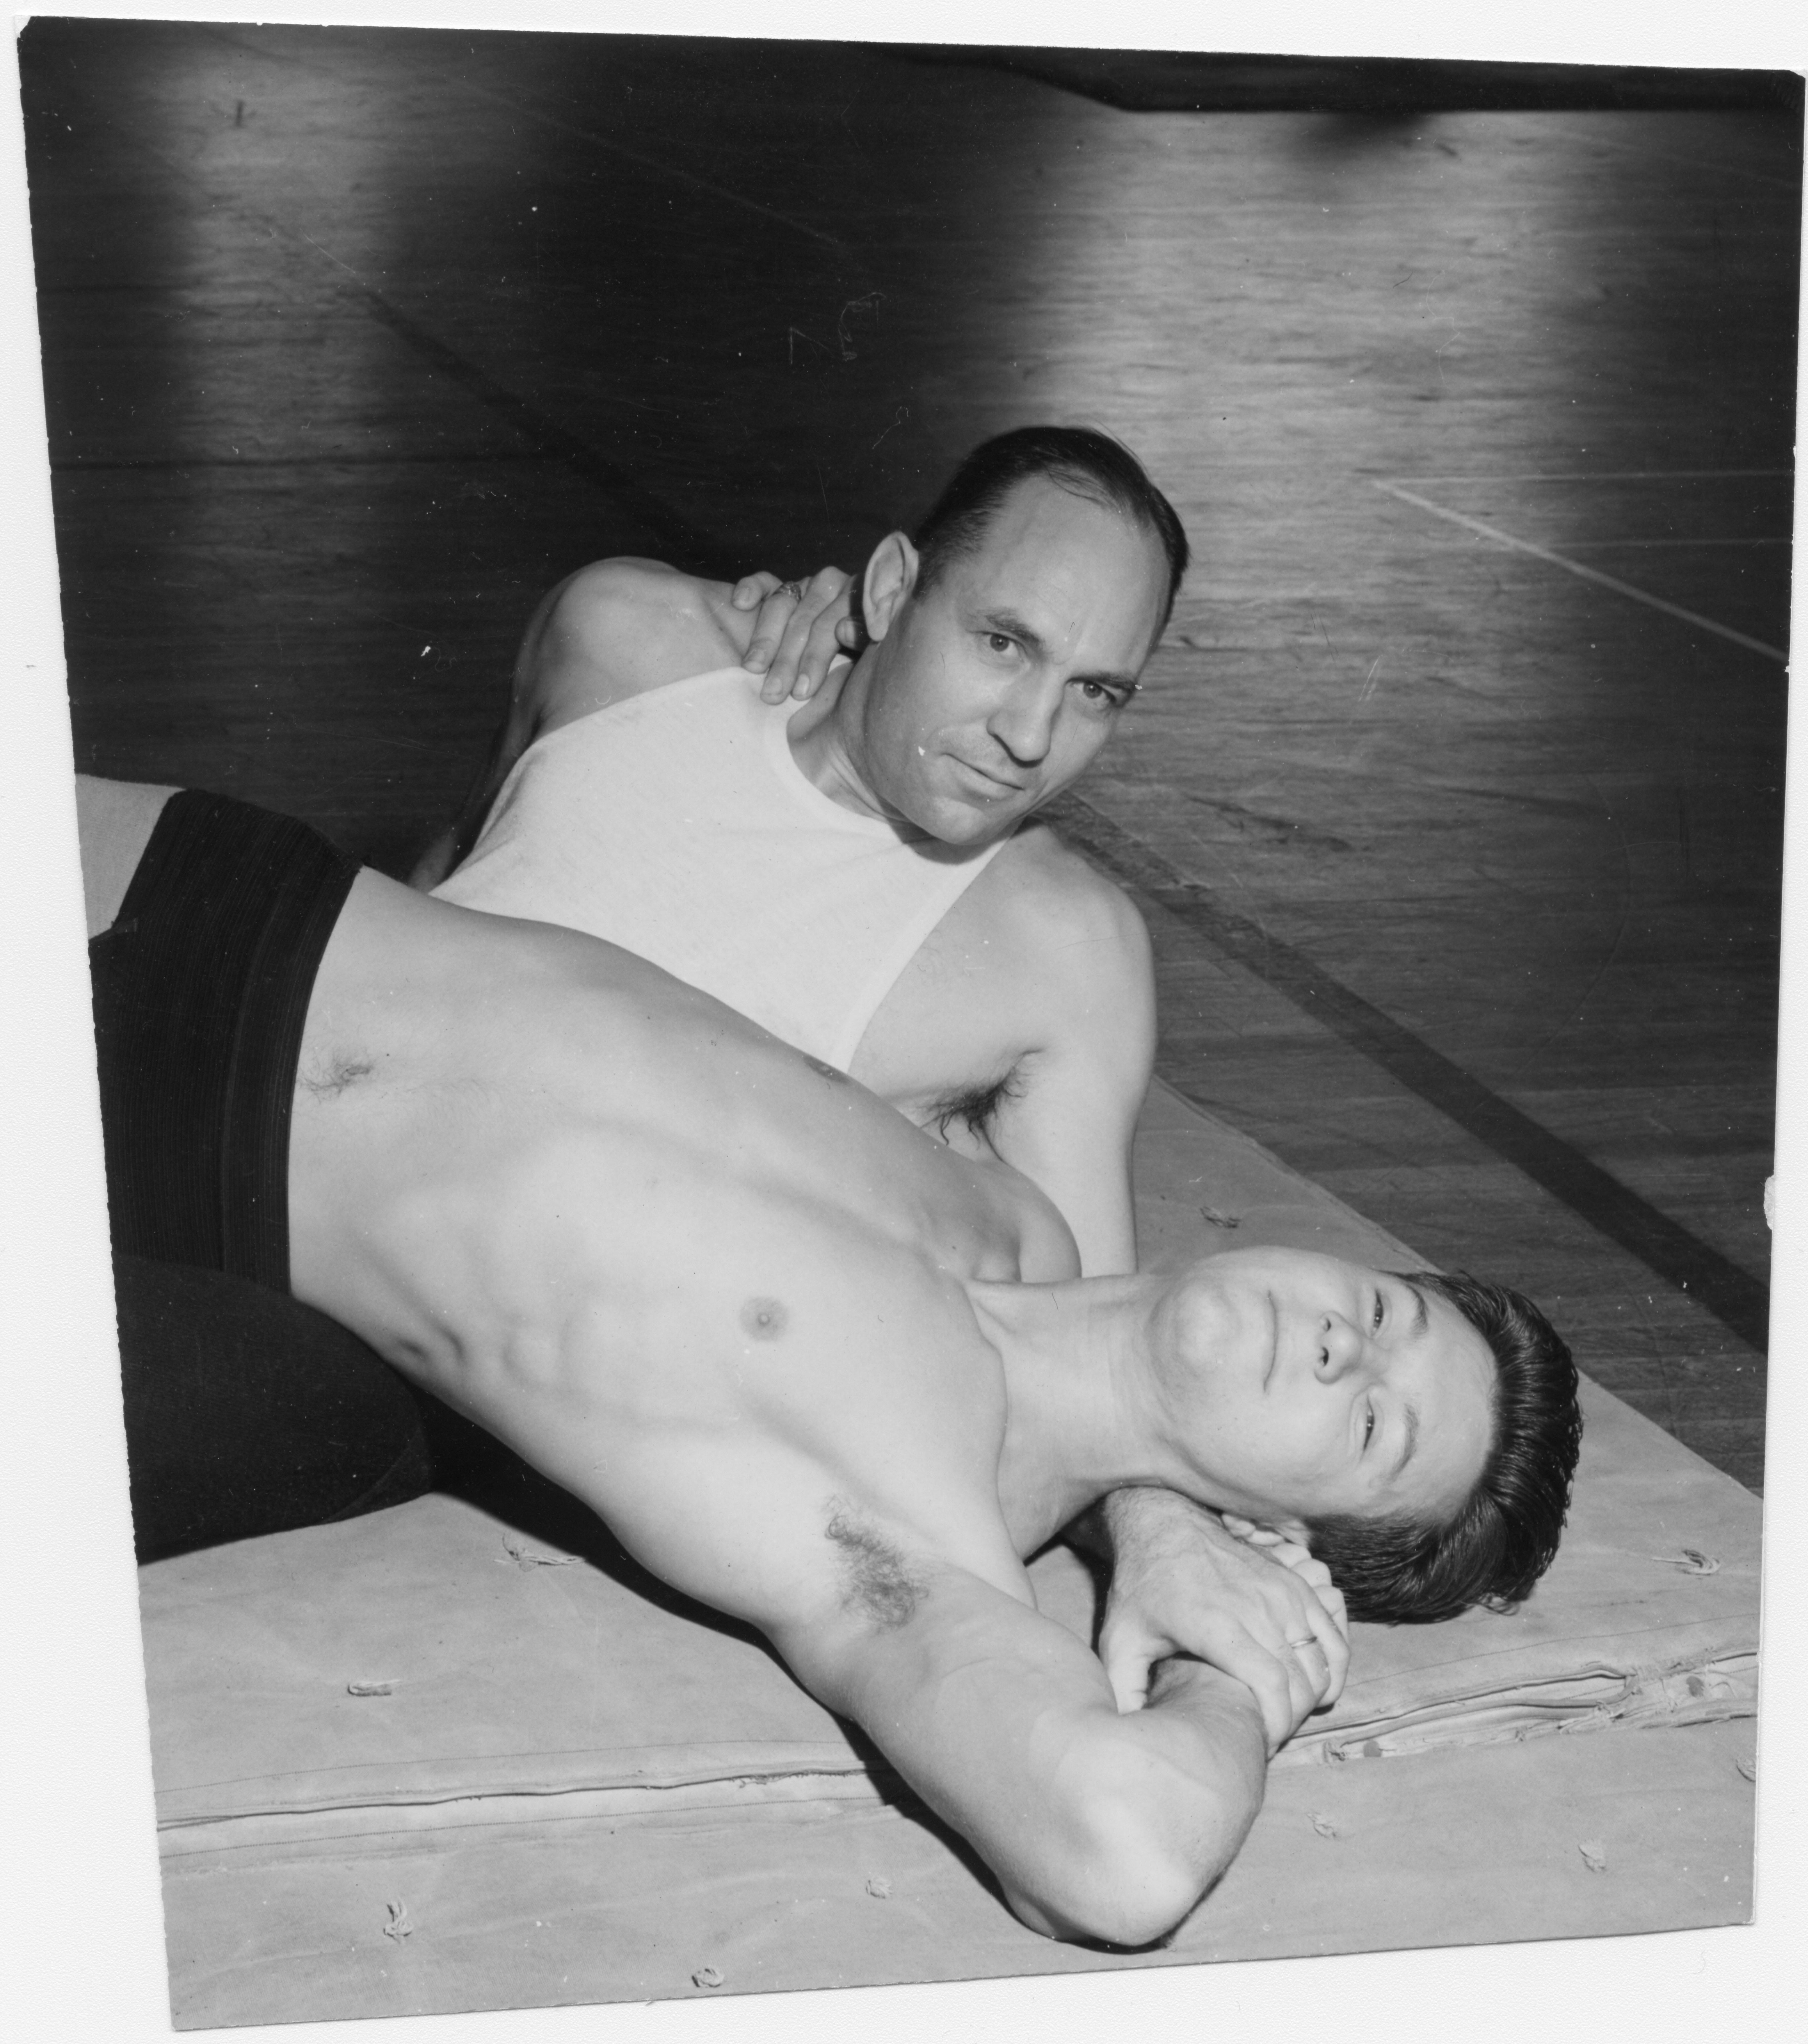 Coach Fendley Collins with Wrestler